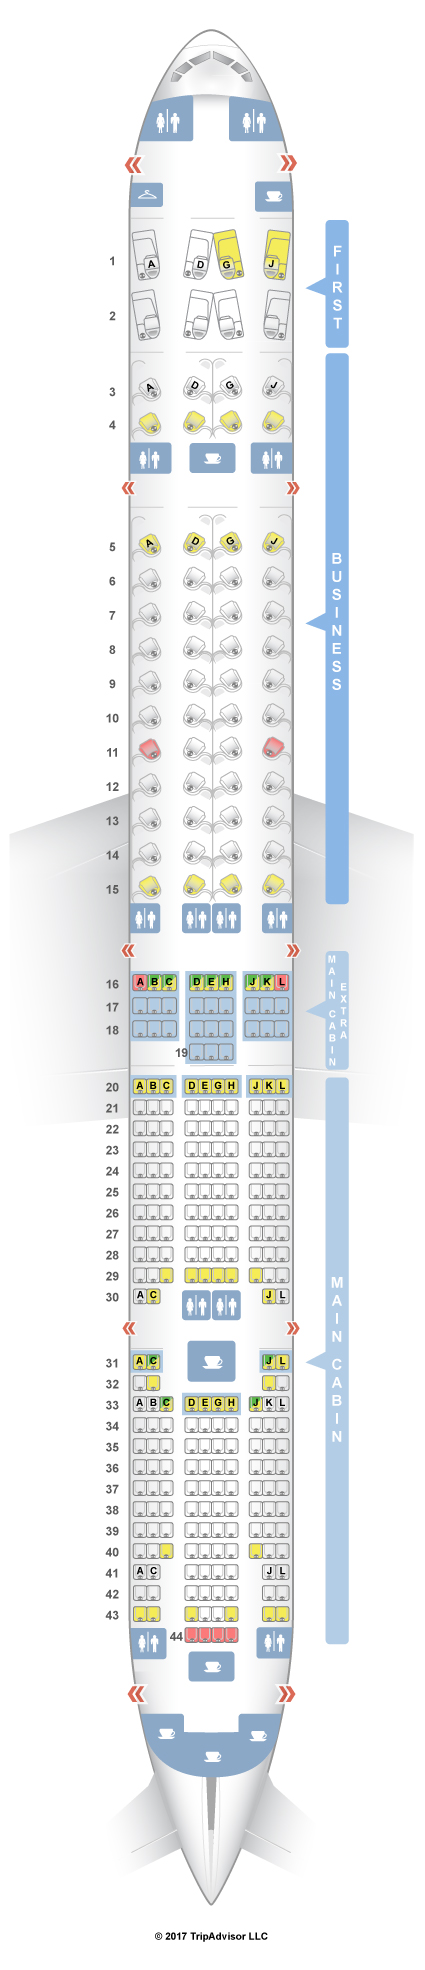 Seating plan for boeing 777 300er for Plan cabine 777 300er